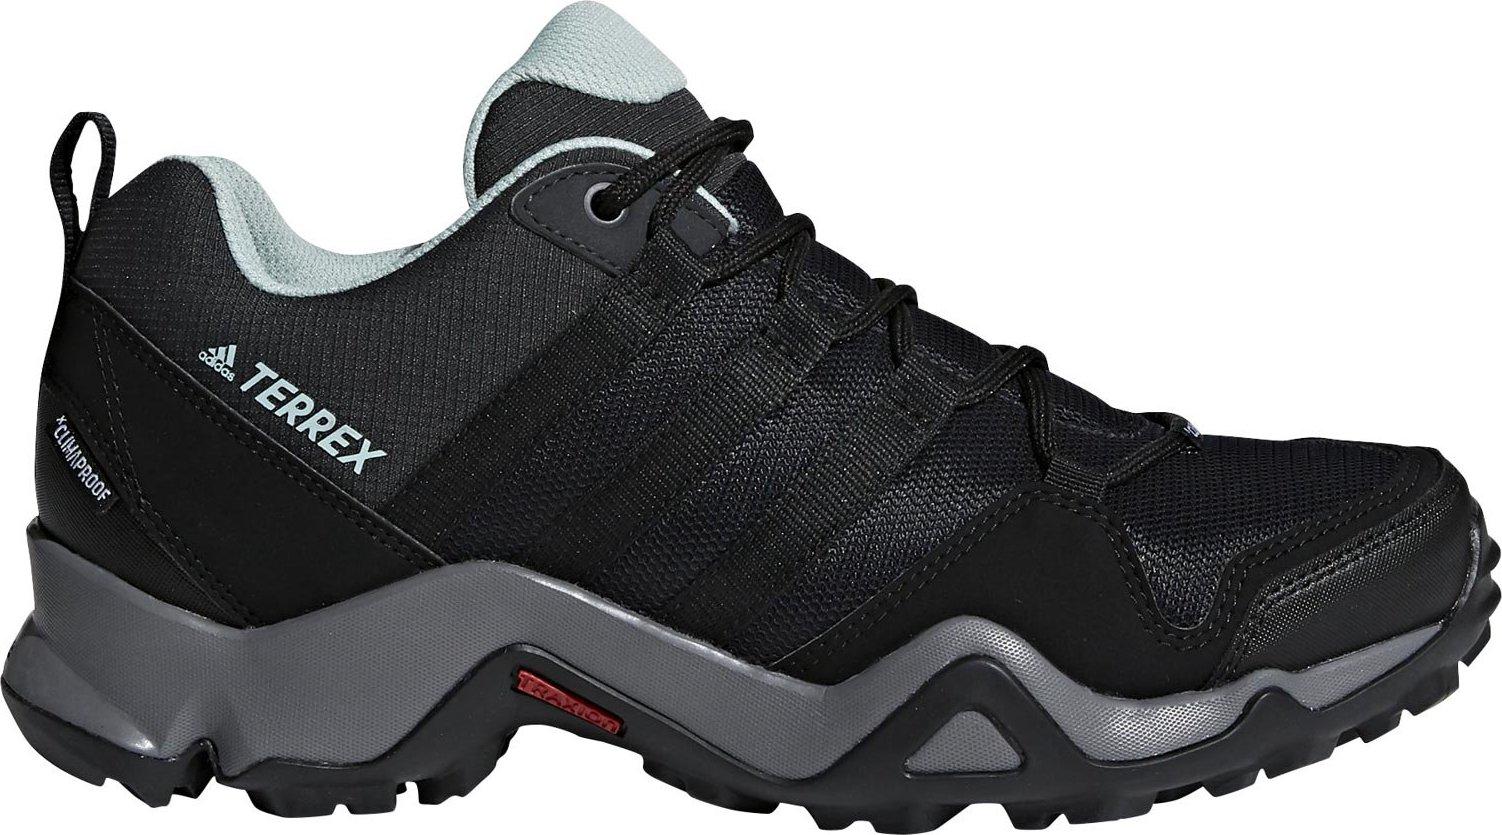 Adidas Terrex AX2 CP W černé mint od 1 673 Kč • Zboží.cz 31e7daa669